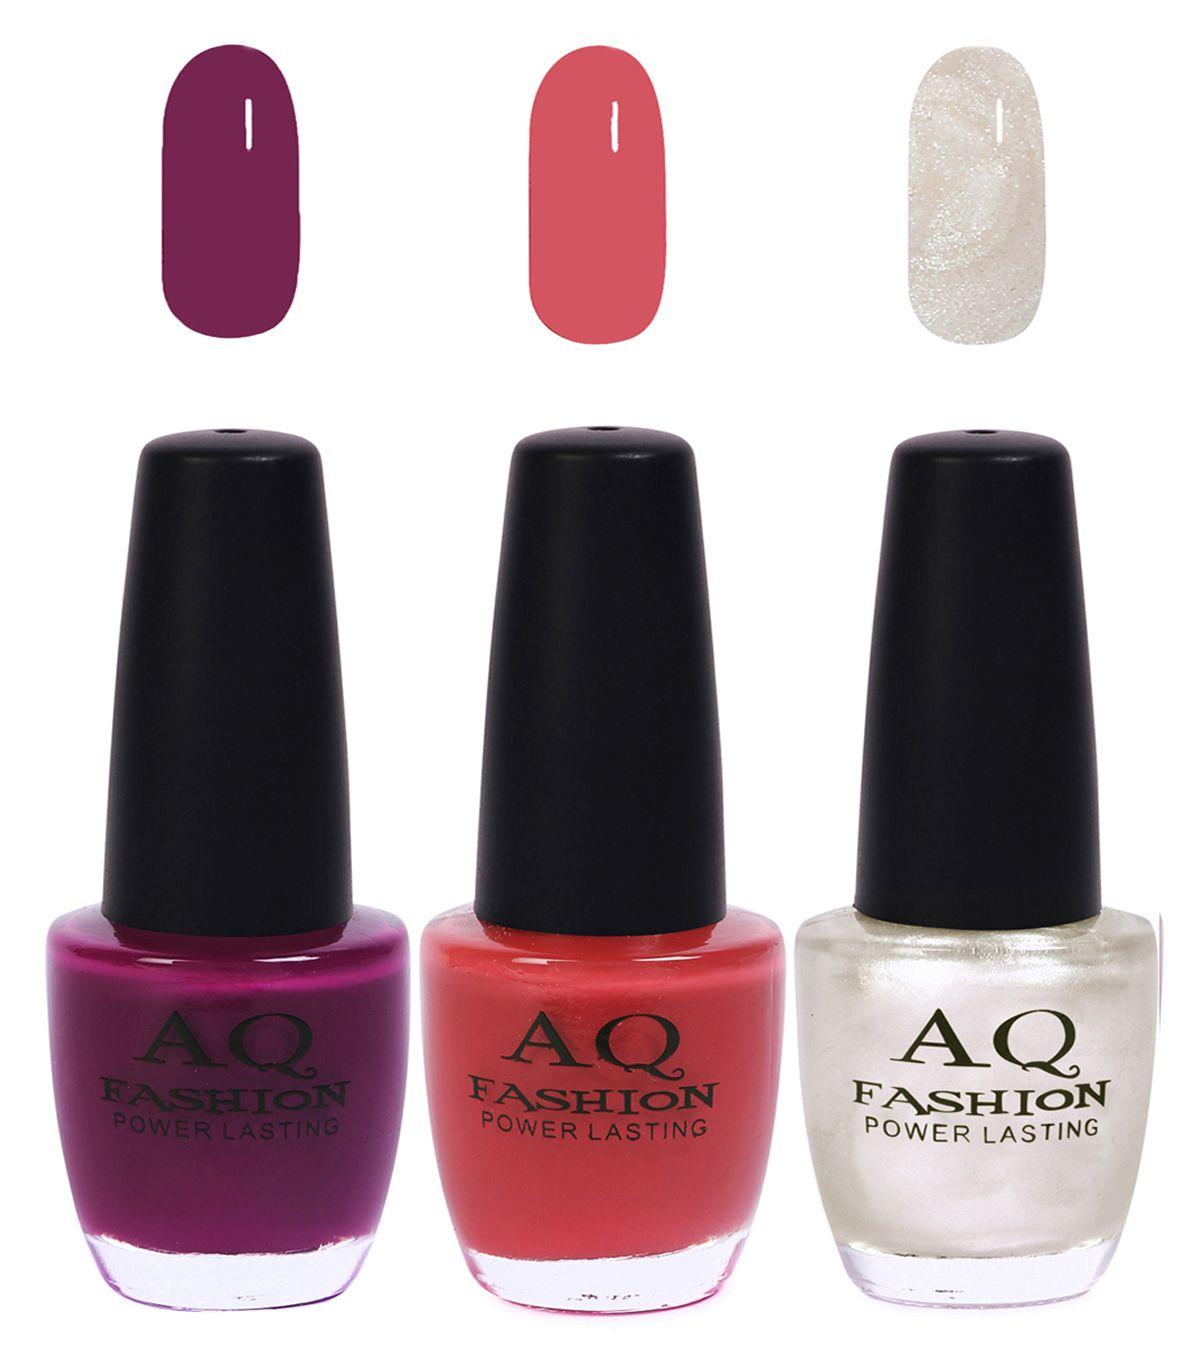 AQ Fashion Nail Polish Neon Colors Matte 36 ml